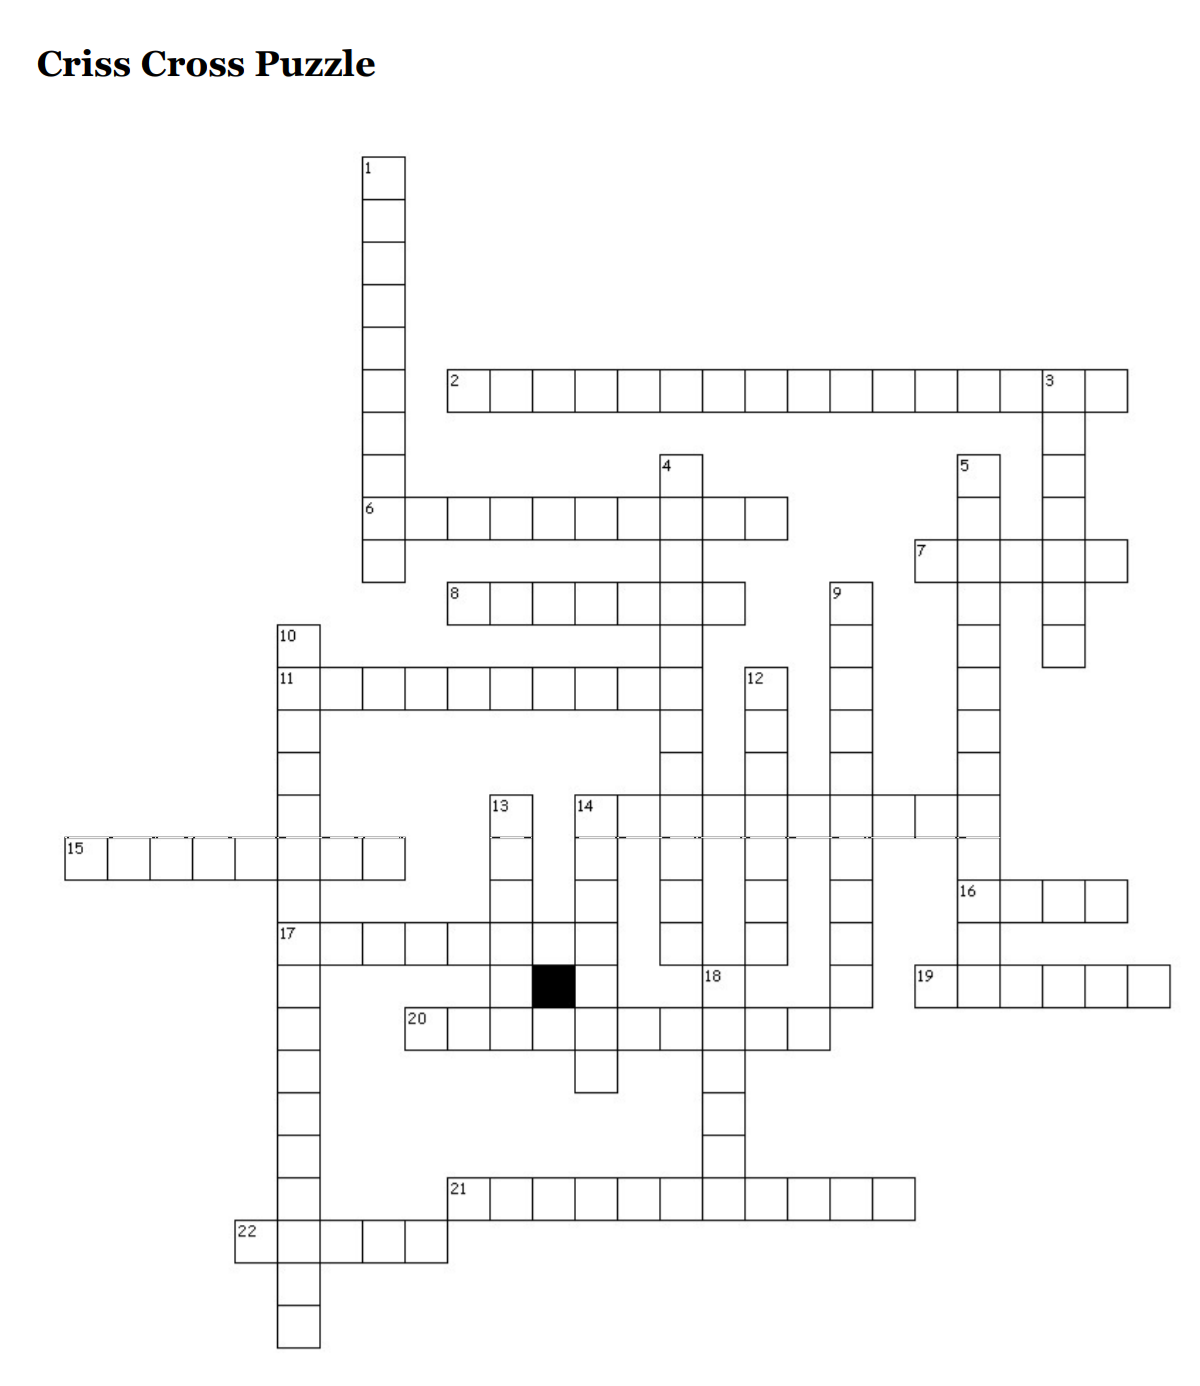 GC Crossword Puzzle: 2018 Annual Council Edition!